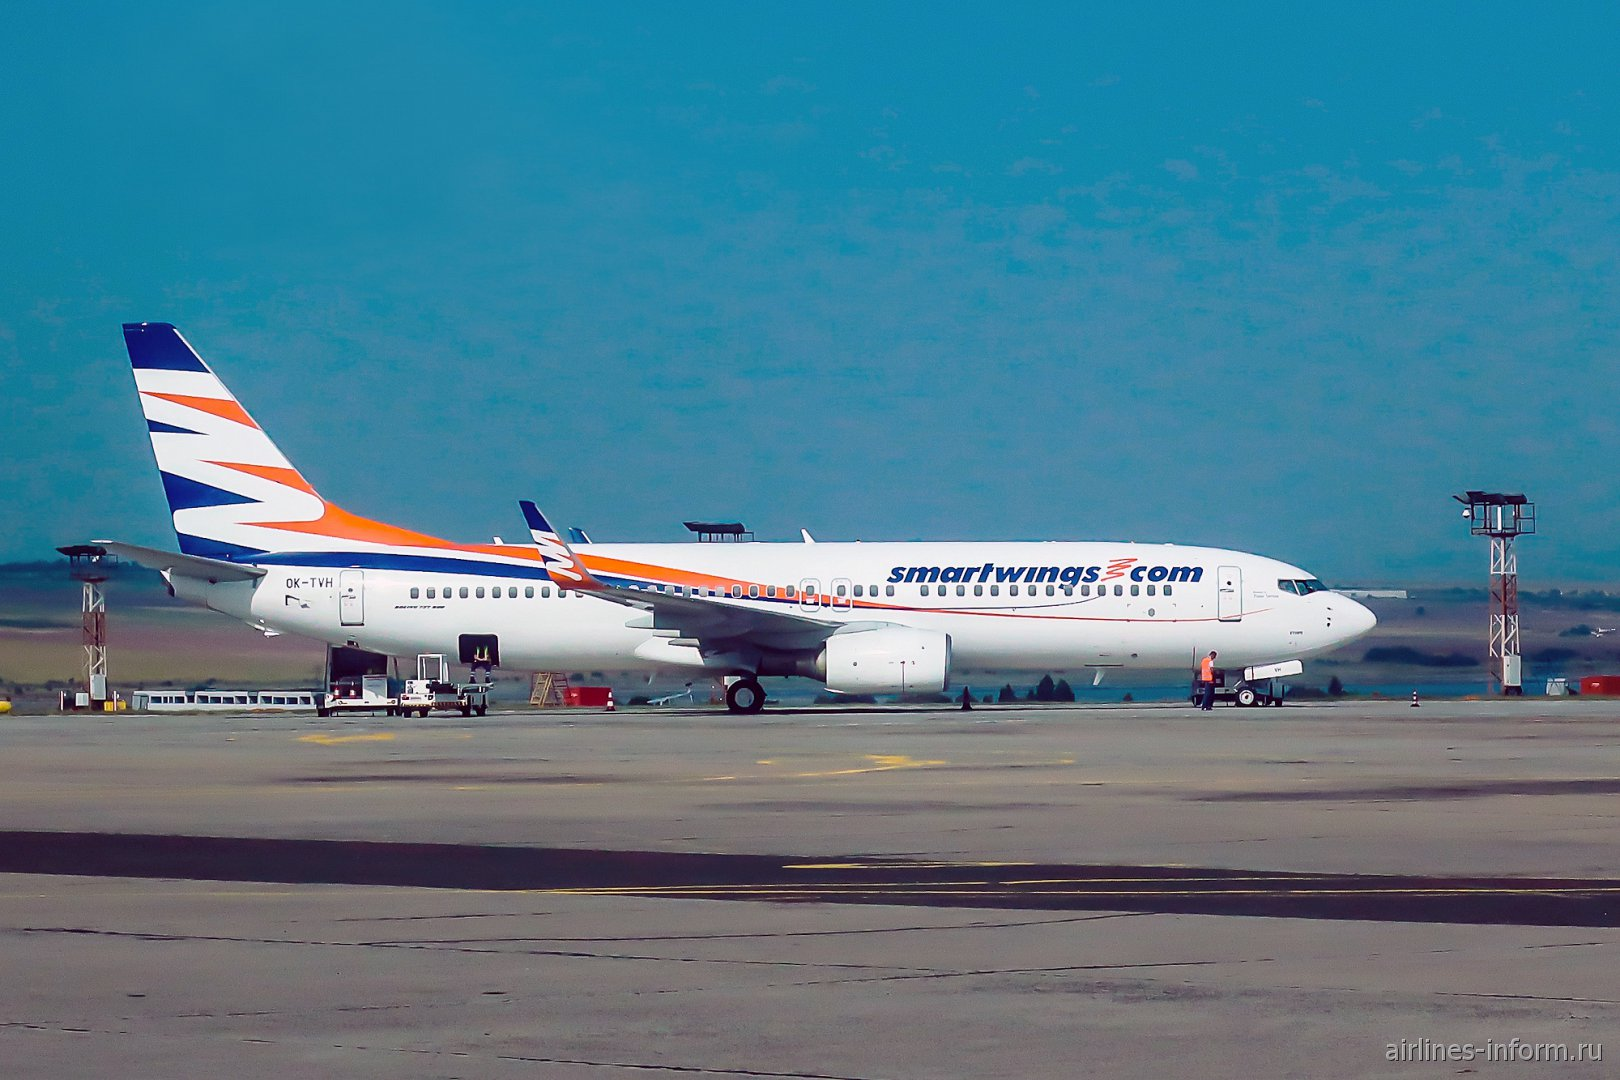 Авиалайнер Боинг-737-800 OK-TVH чешской авиакомпании Smartwings